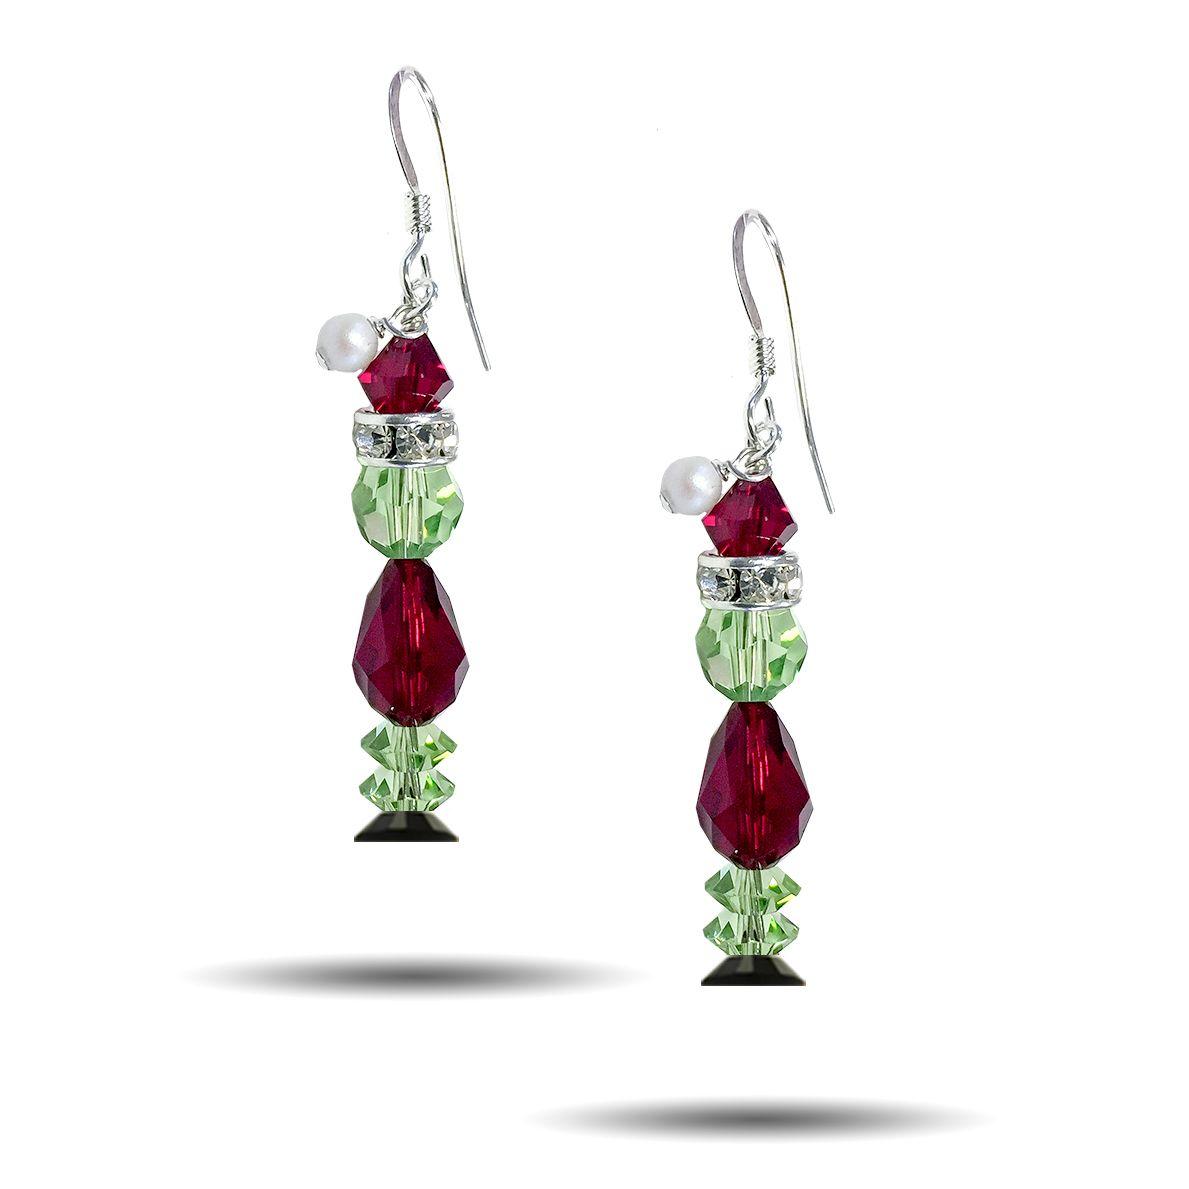 The Grinch Christmas Earring Kit Ships 12 14 16